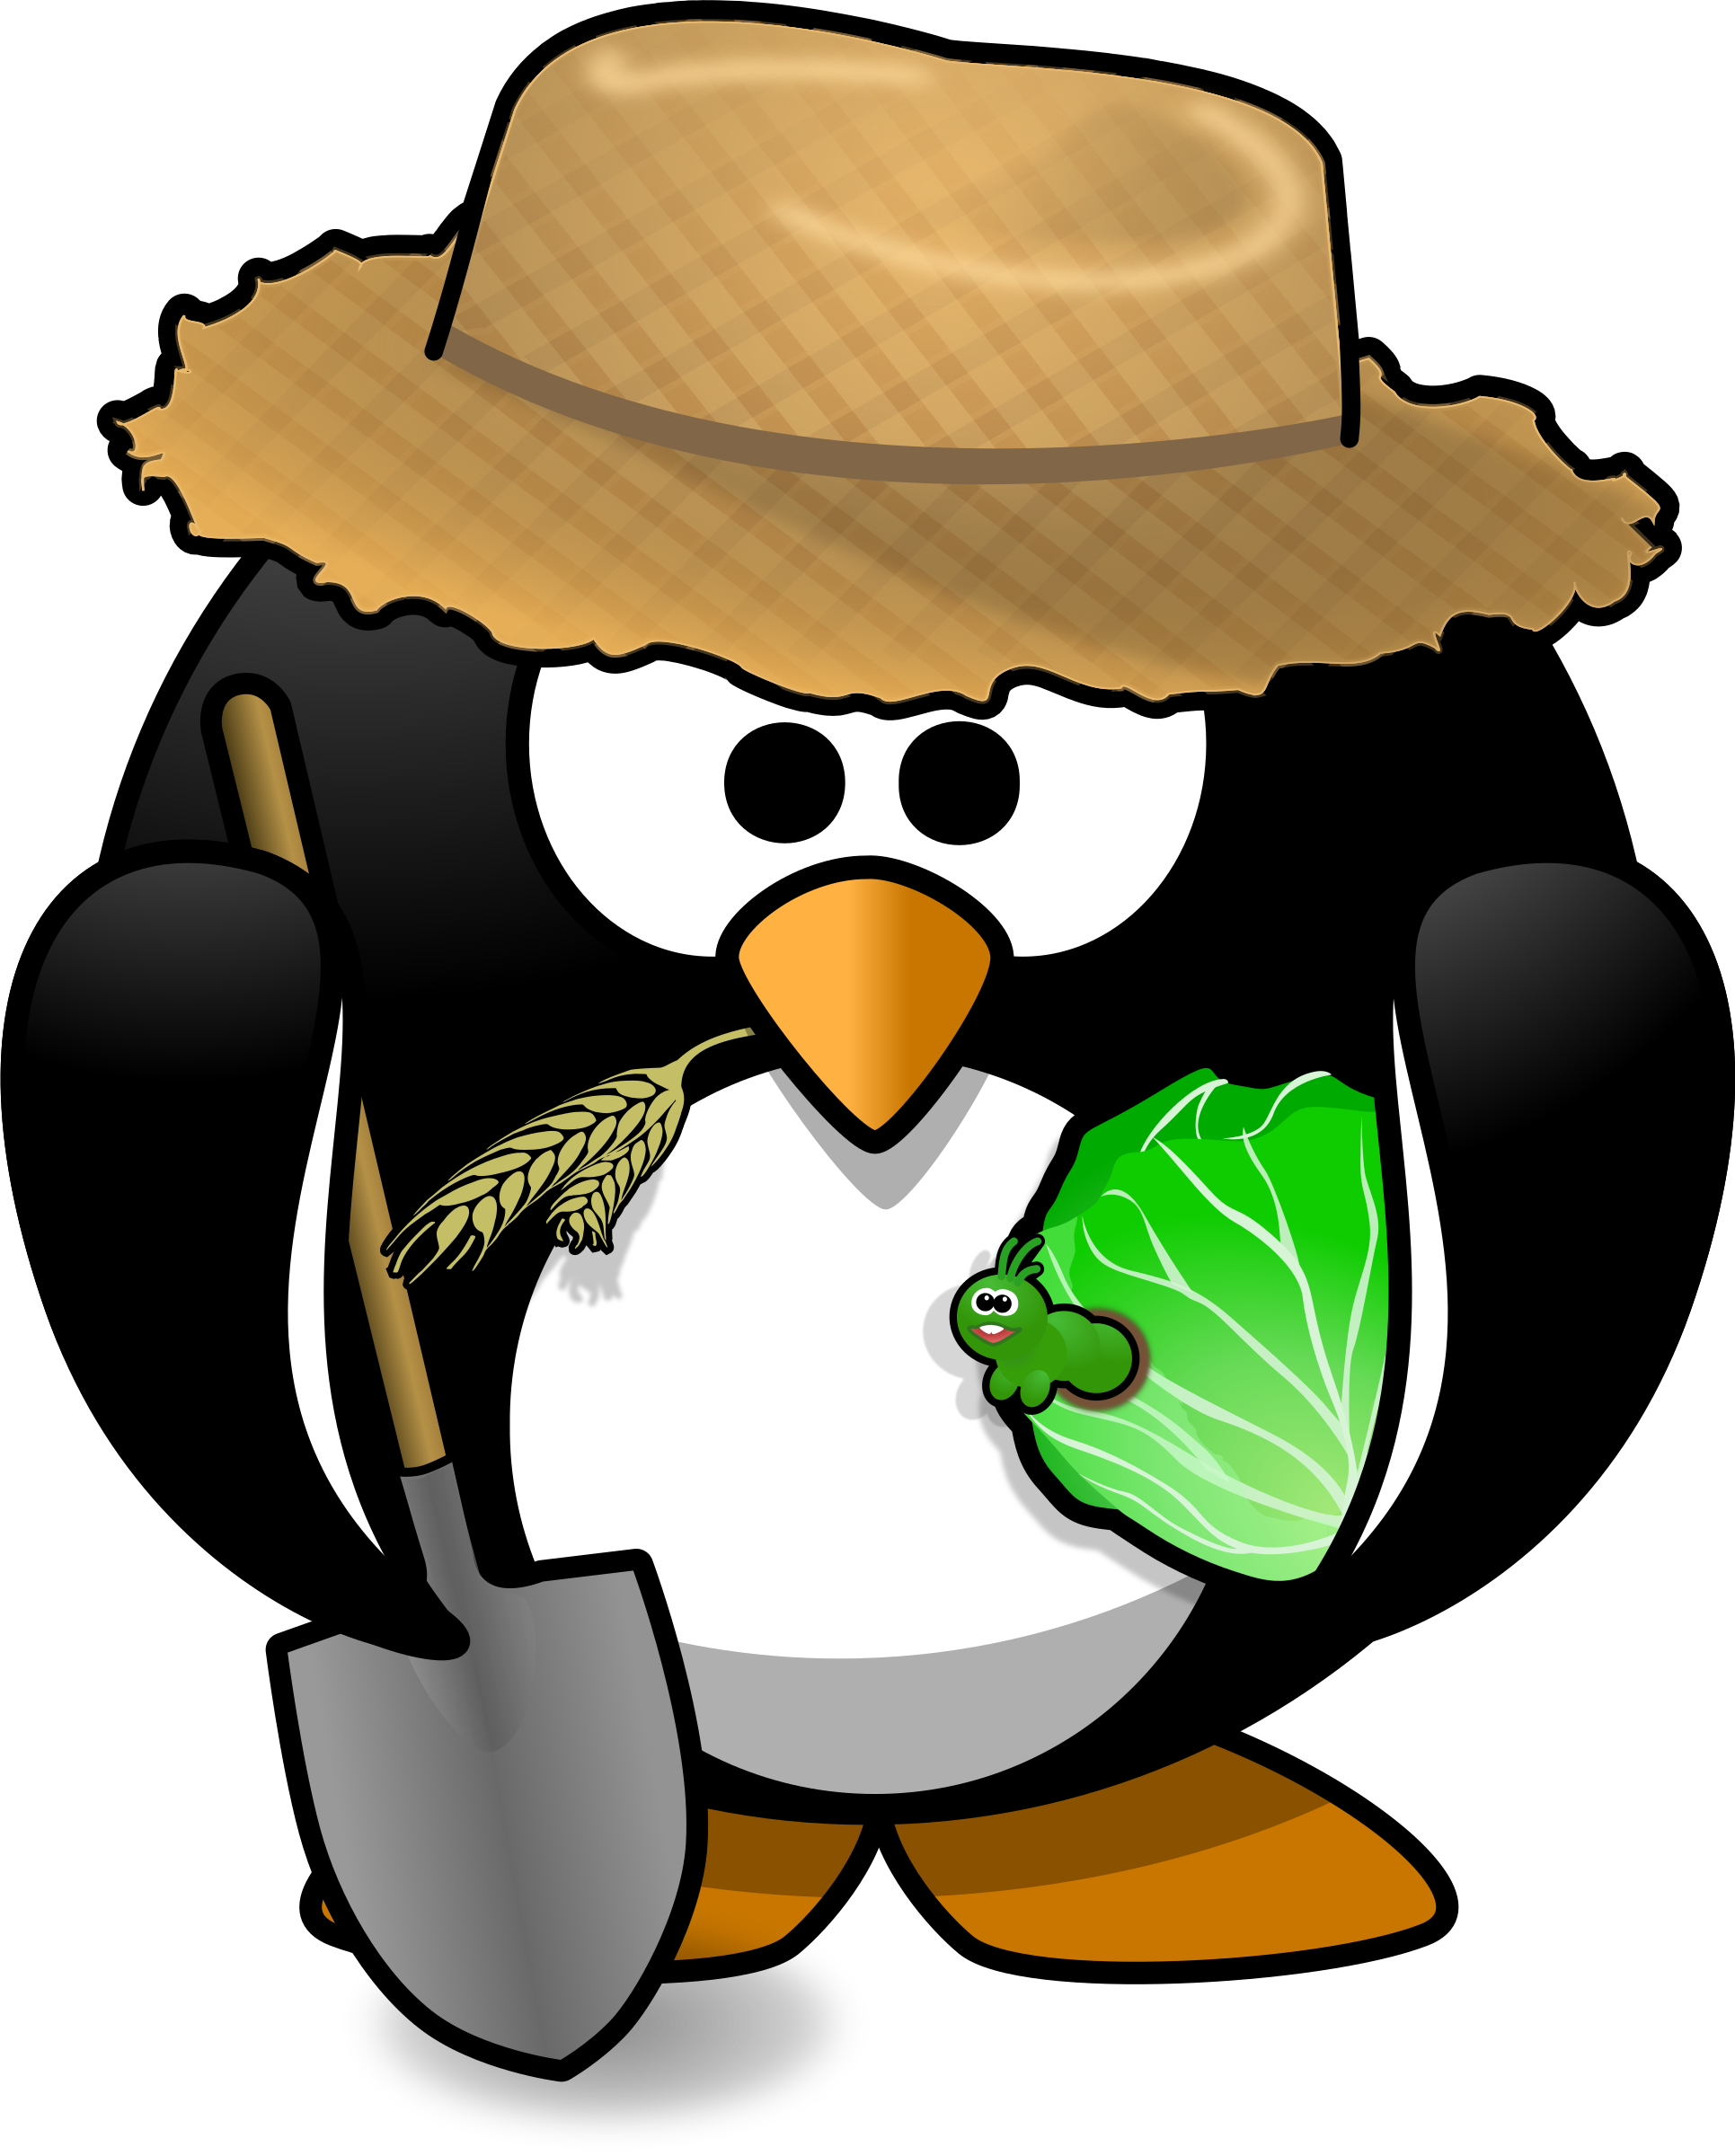 Farmers clipart hat. Free farmer penguin high